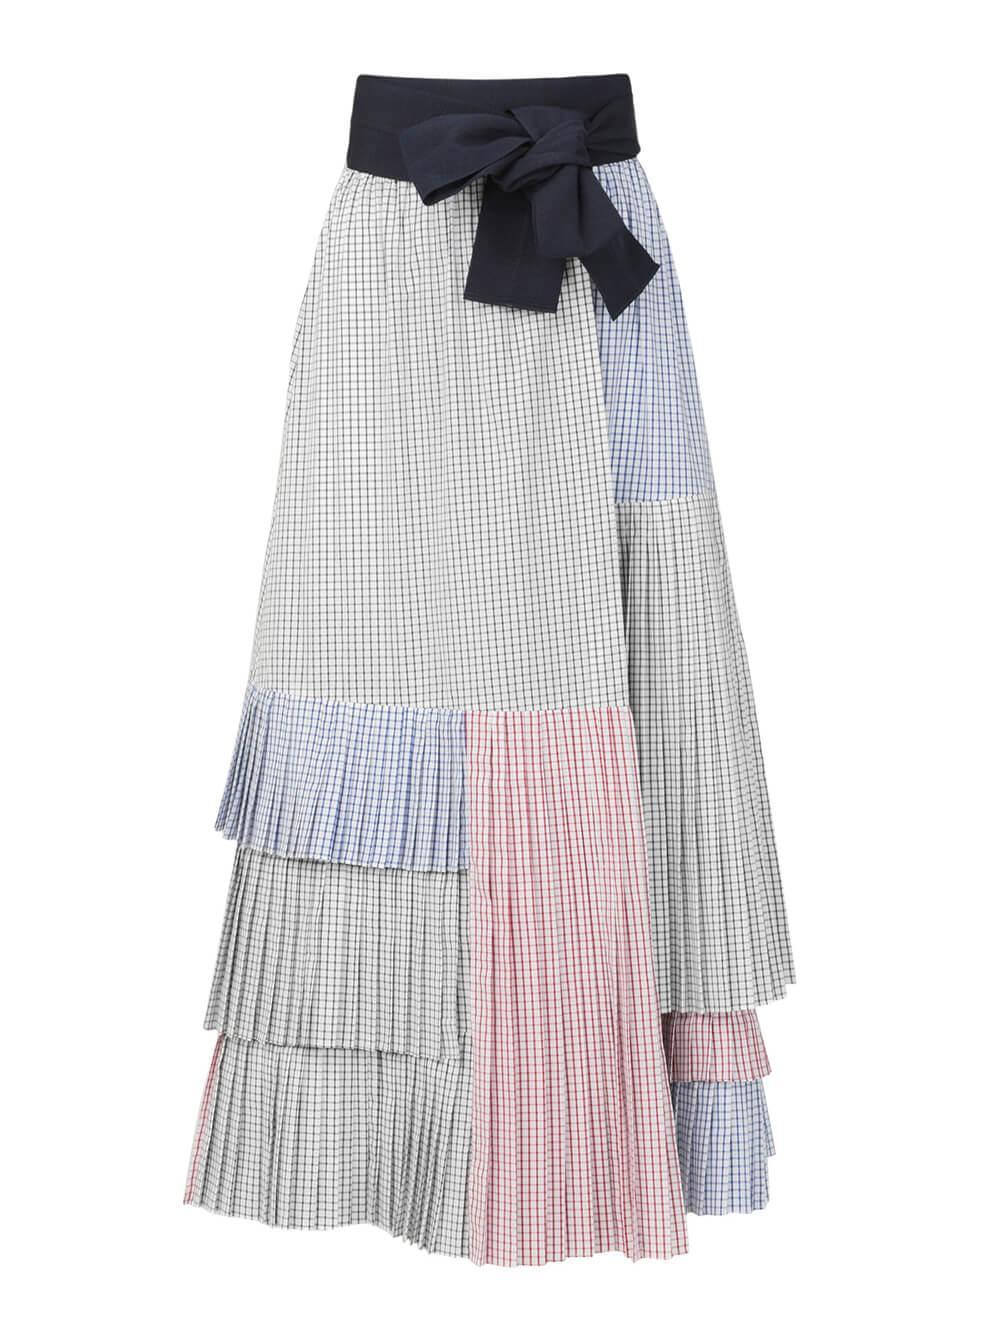 Siena Skirt Item # 7702931-47